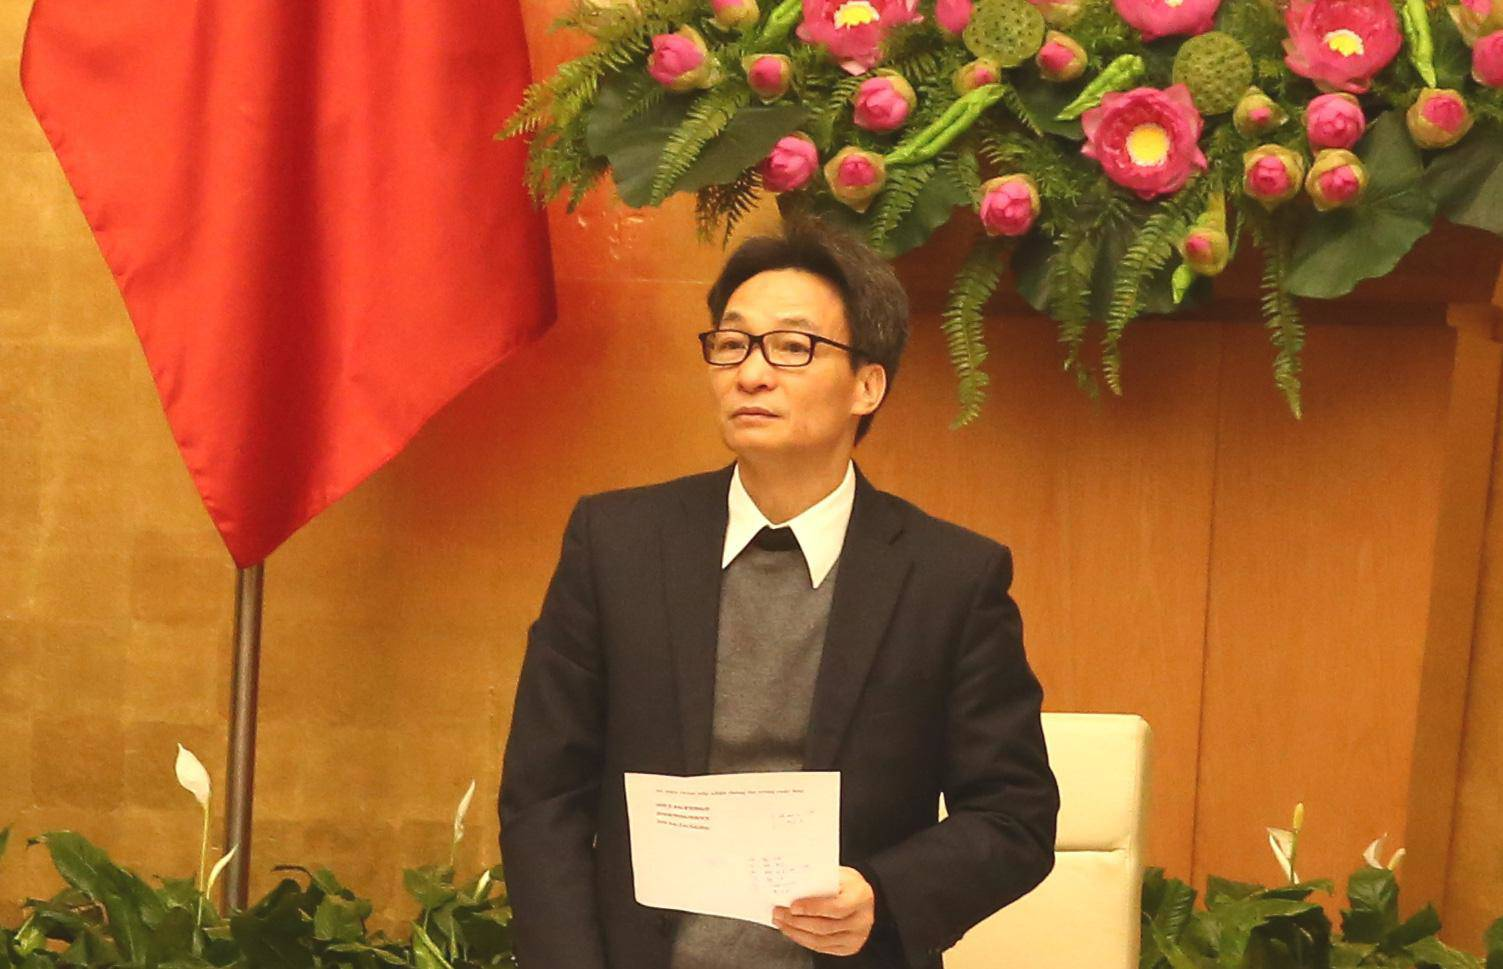 pho thu tuong: neu chua lam duoc cho phu huynh, hs an tam thi chua nen cho di hoc lai - 1